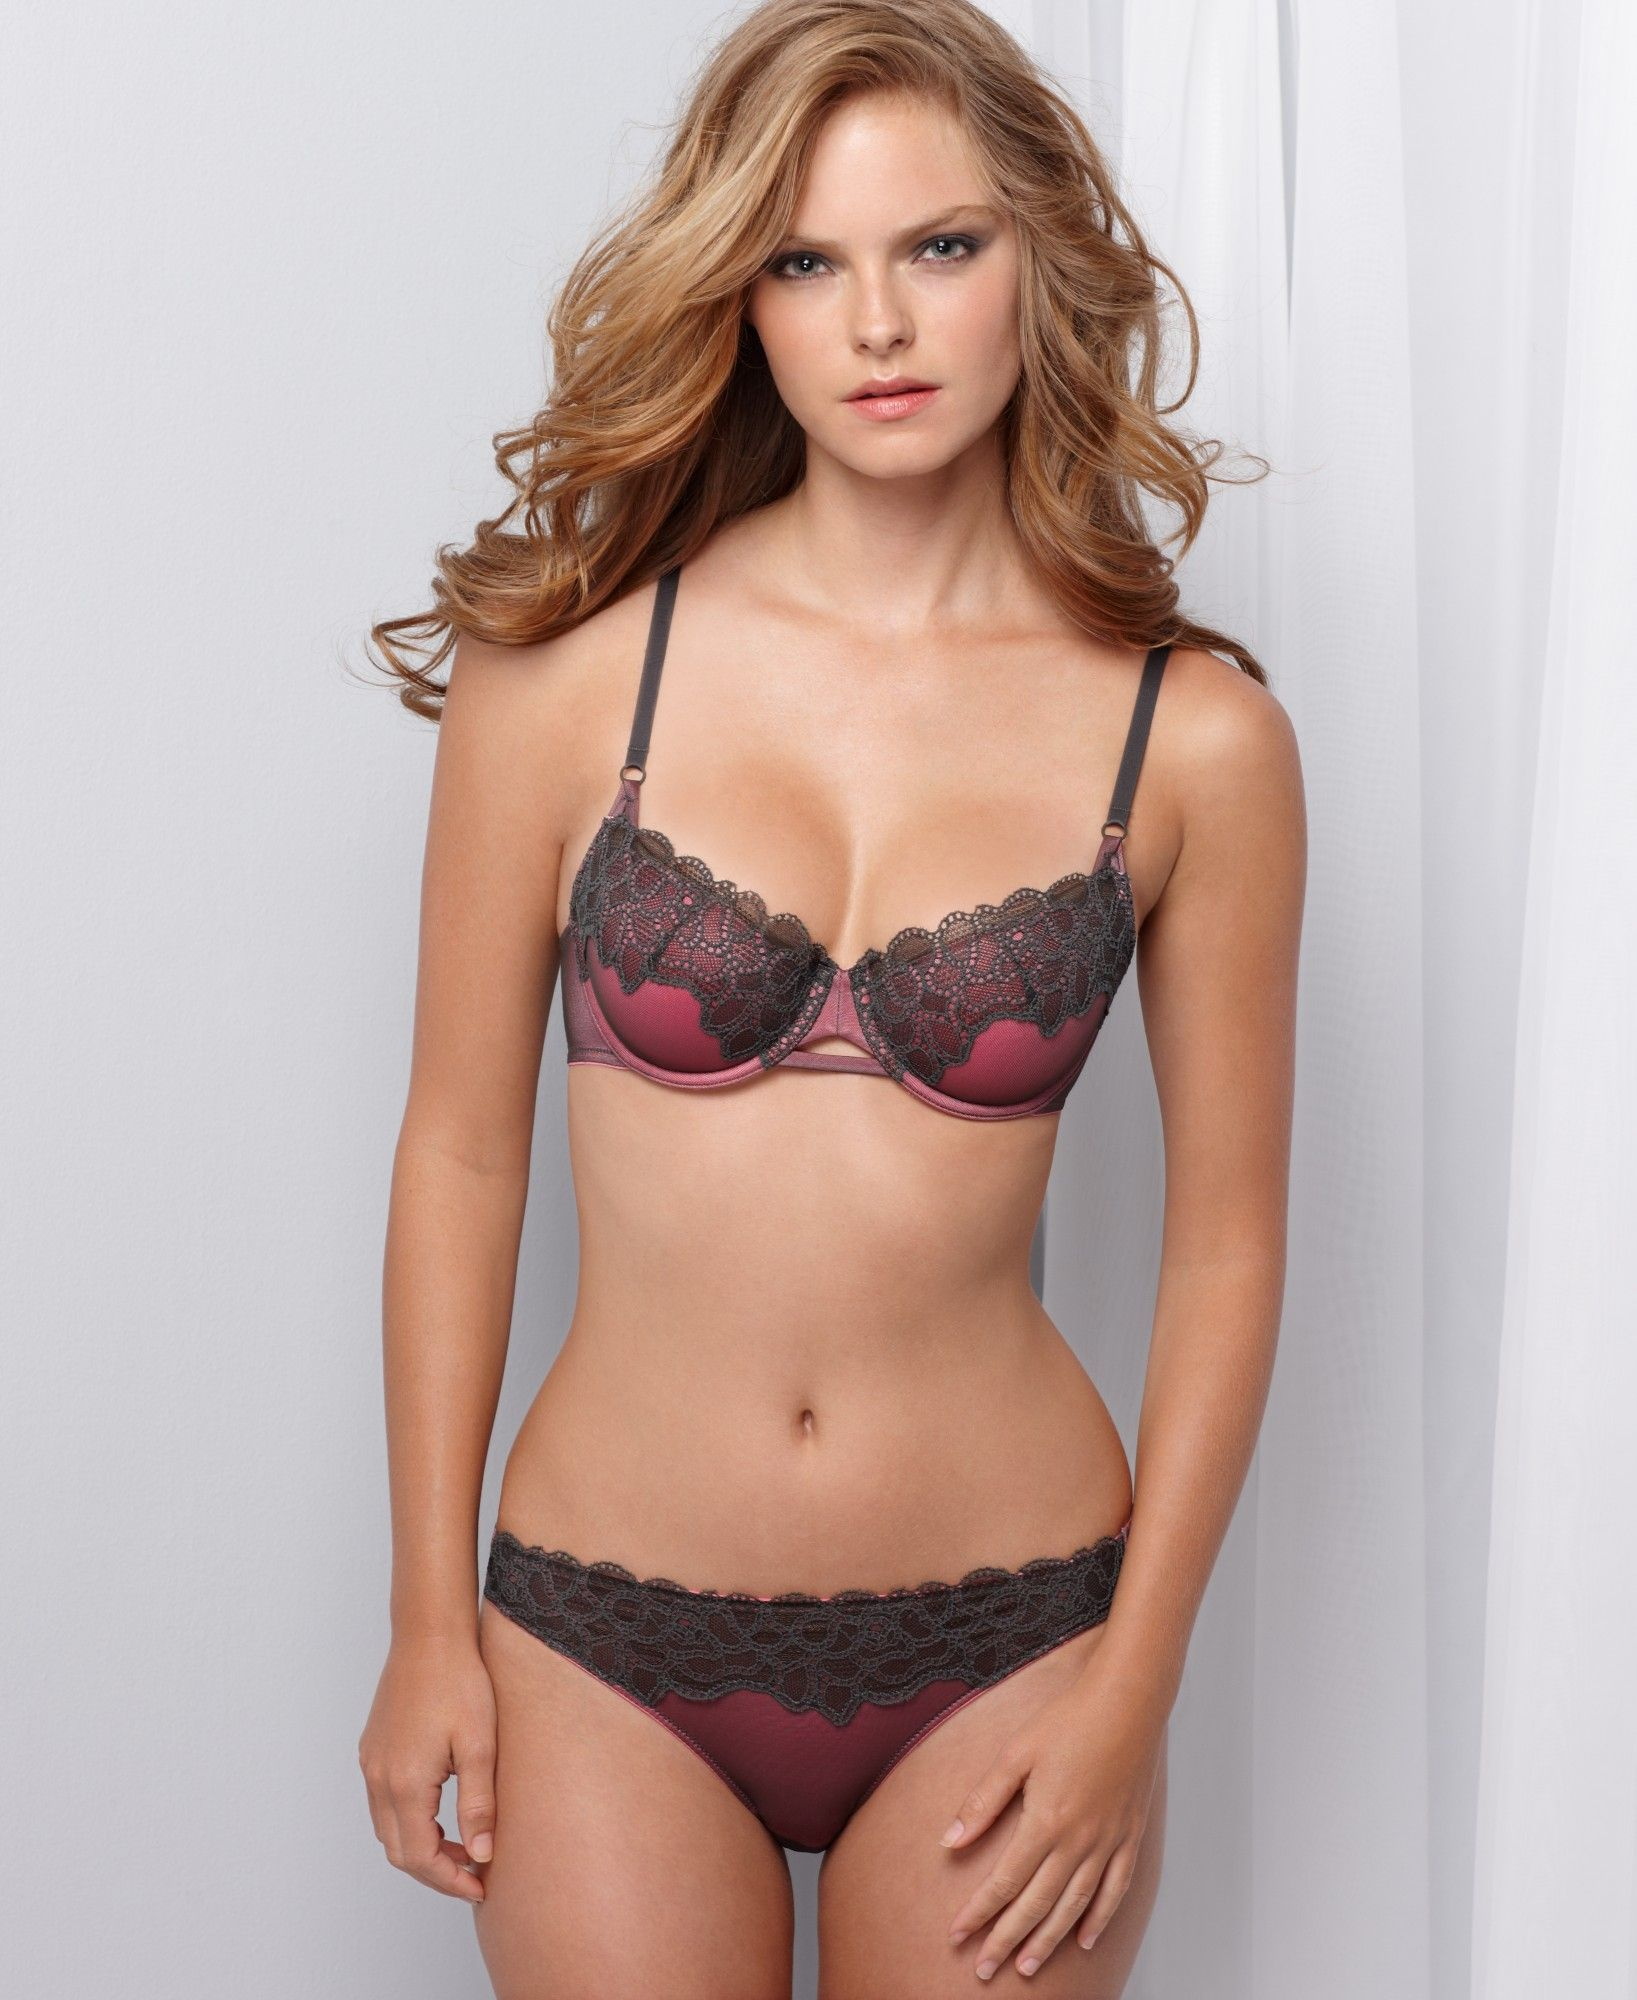 Jessica_Perez_13.jpg | Models Rating